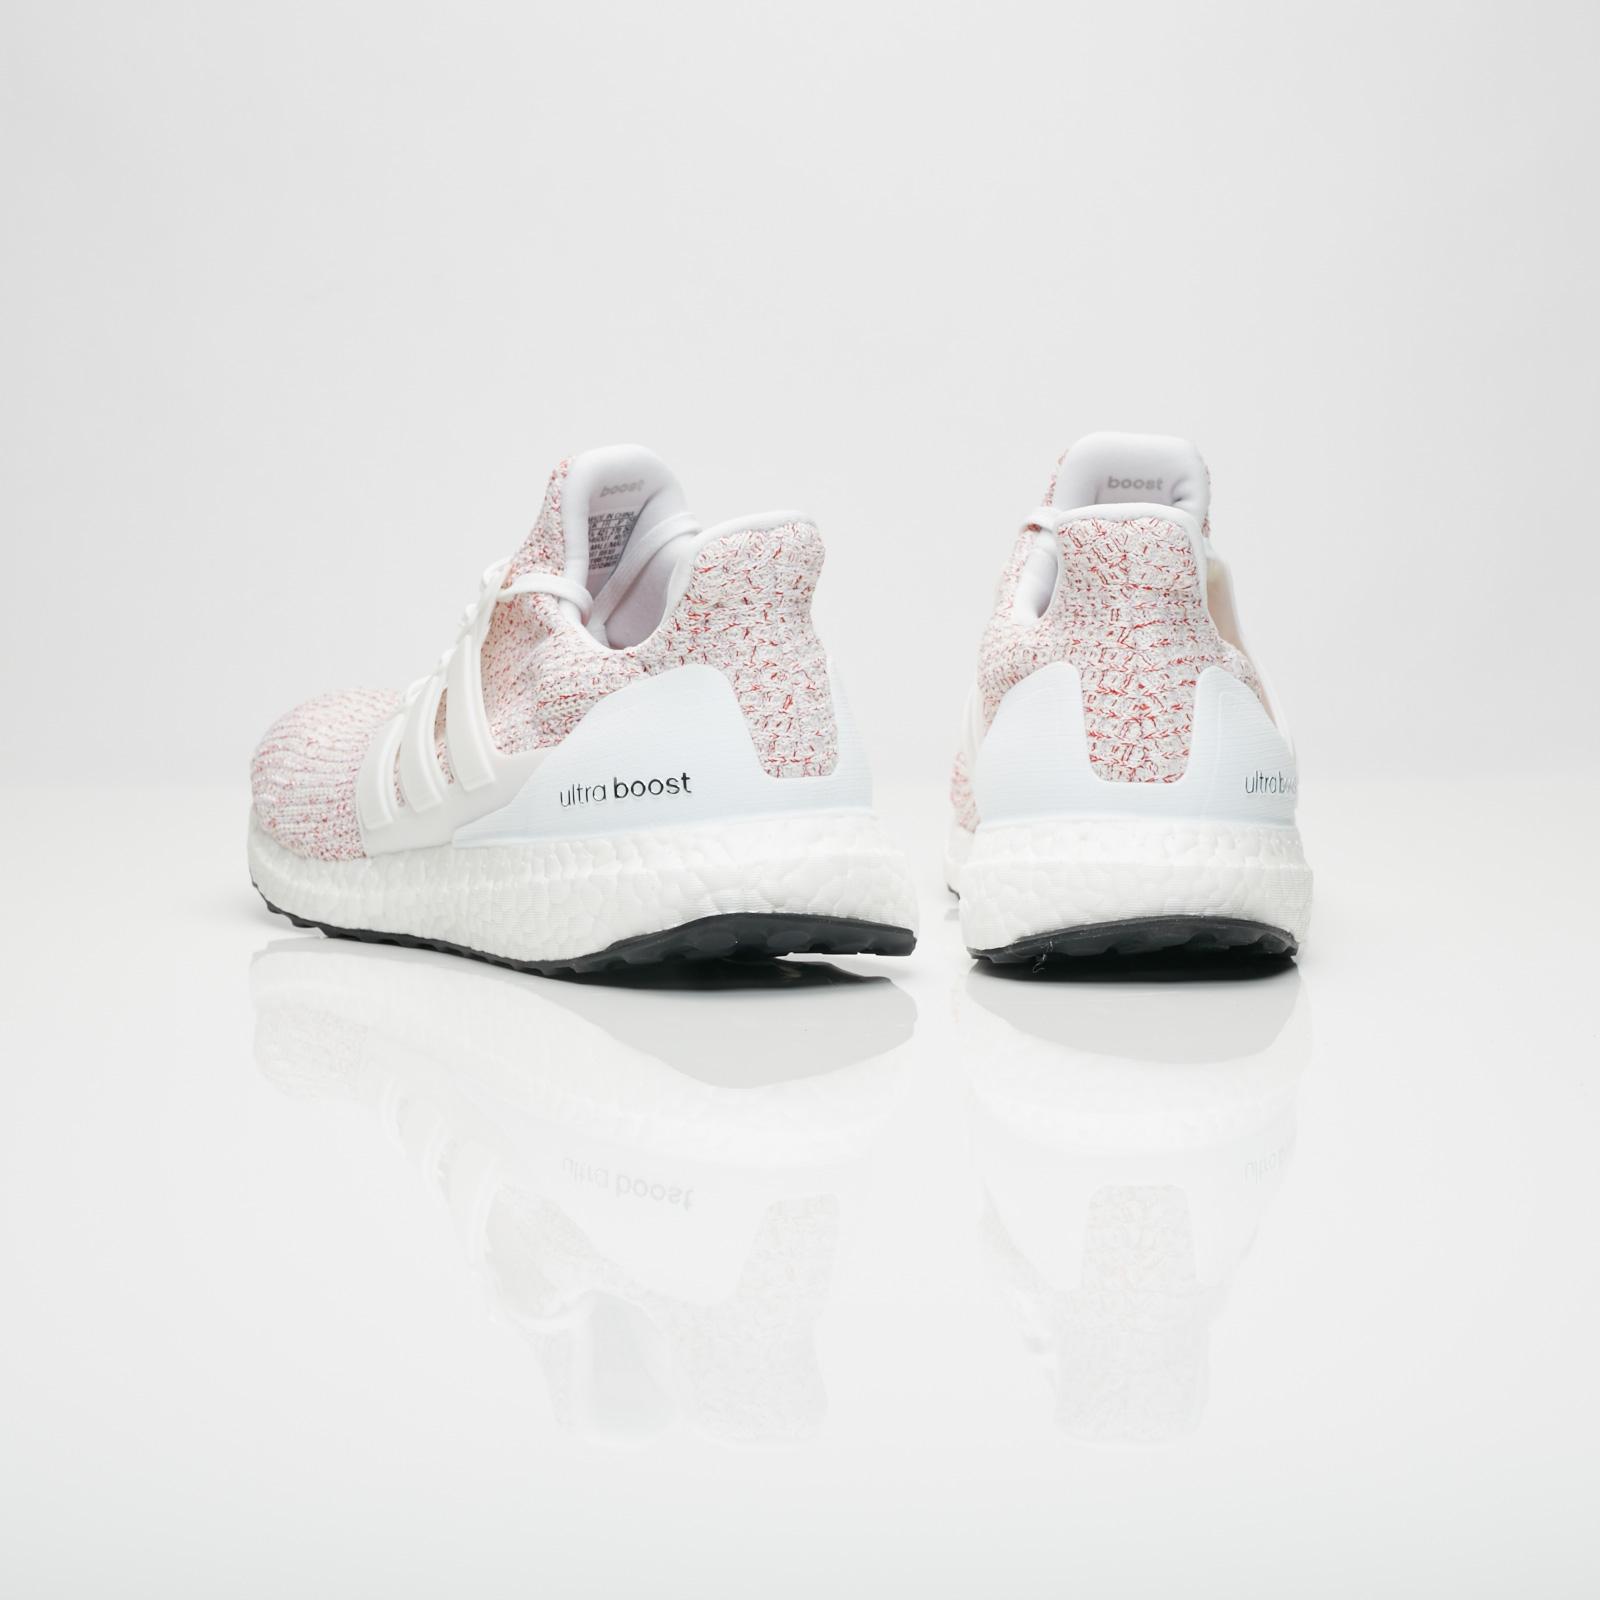 1c09206d07042 adidas Ultra Boost - Bb6169 - Sneakersnstuff